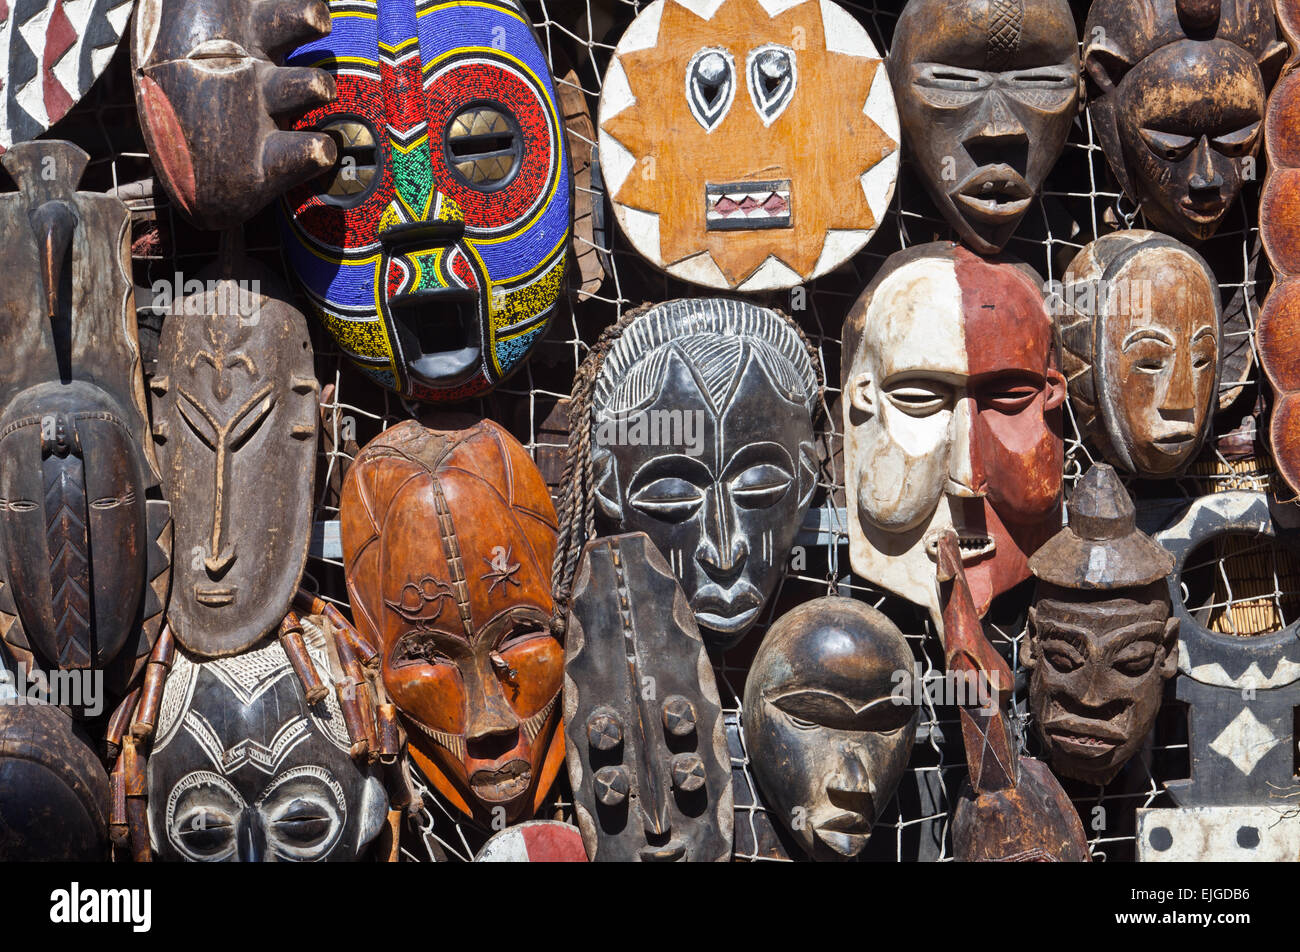 traditionelle afrikanische masken f r h ngen an einem. Black Bedroom Furniture Sets. Home Design Ideas